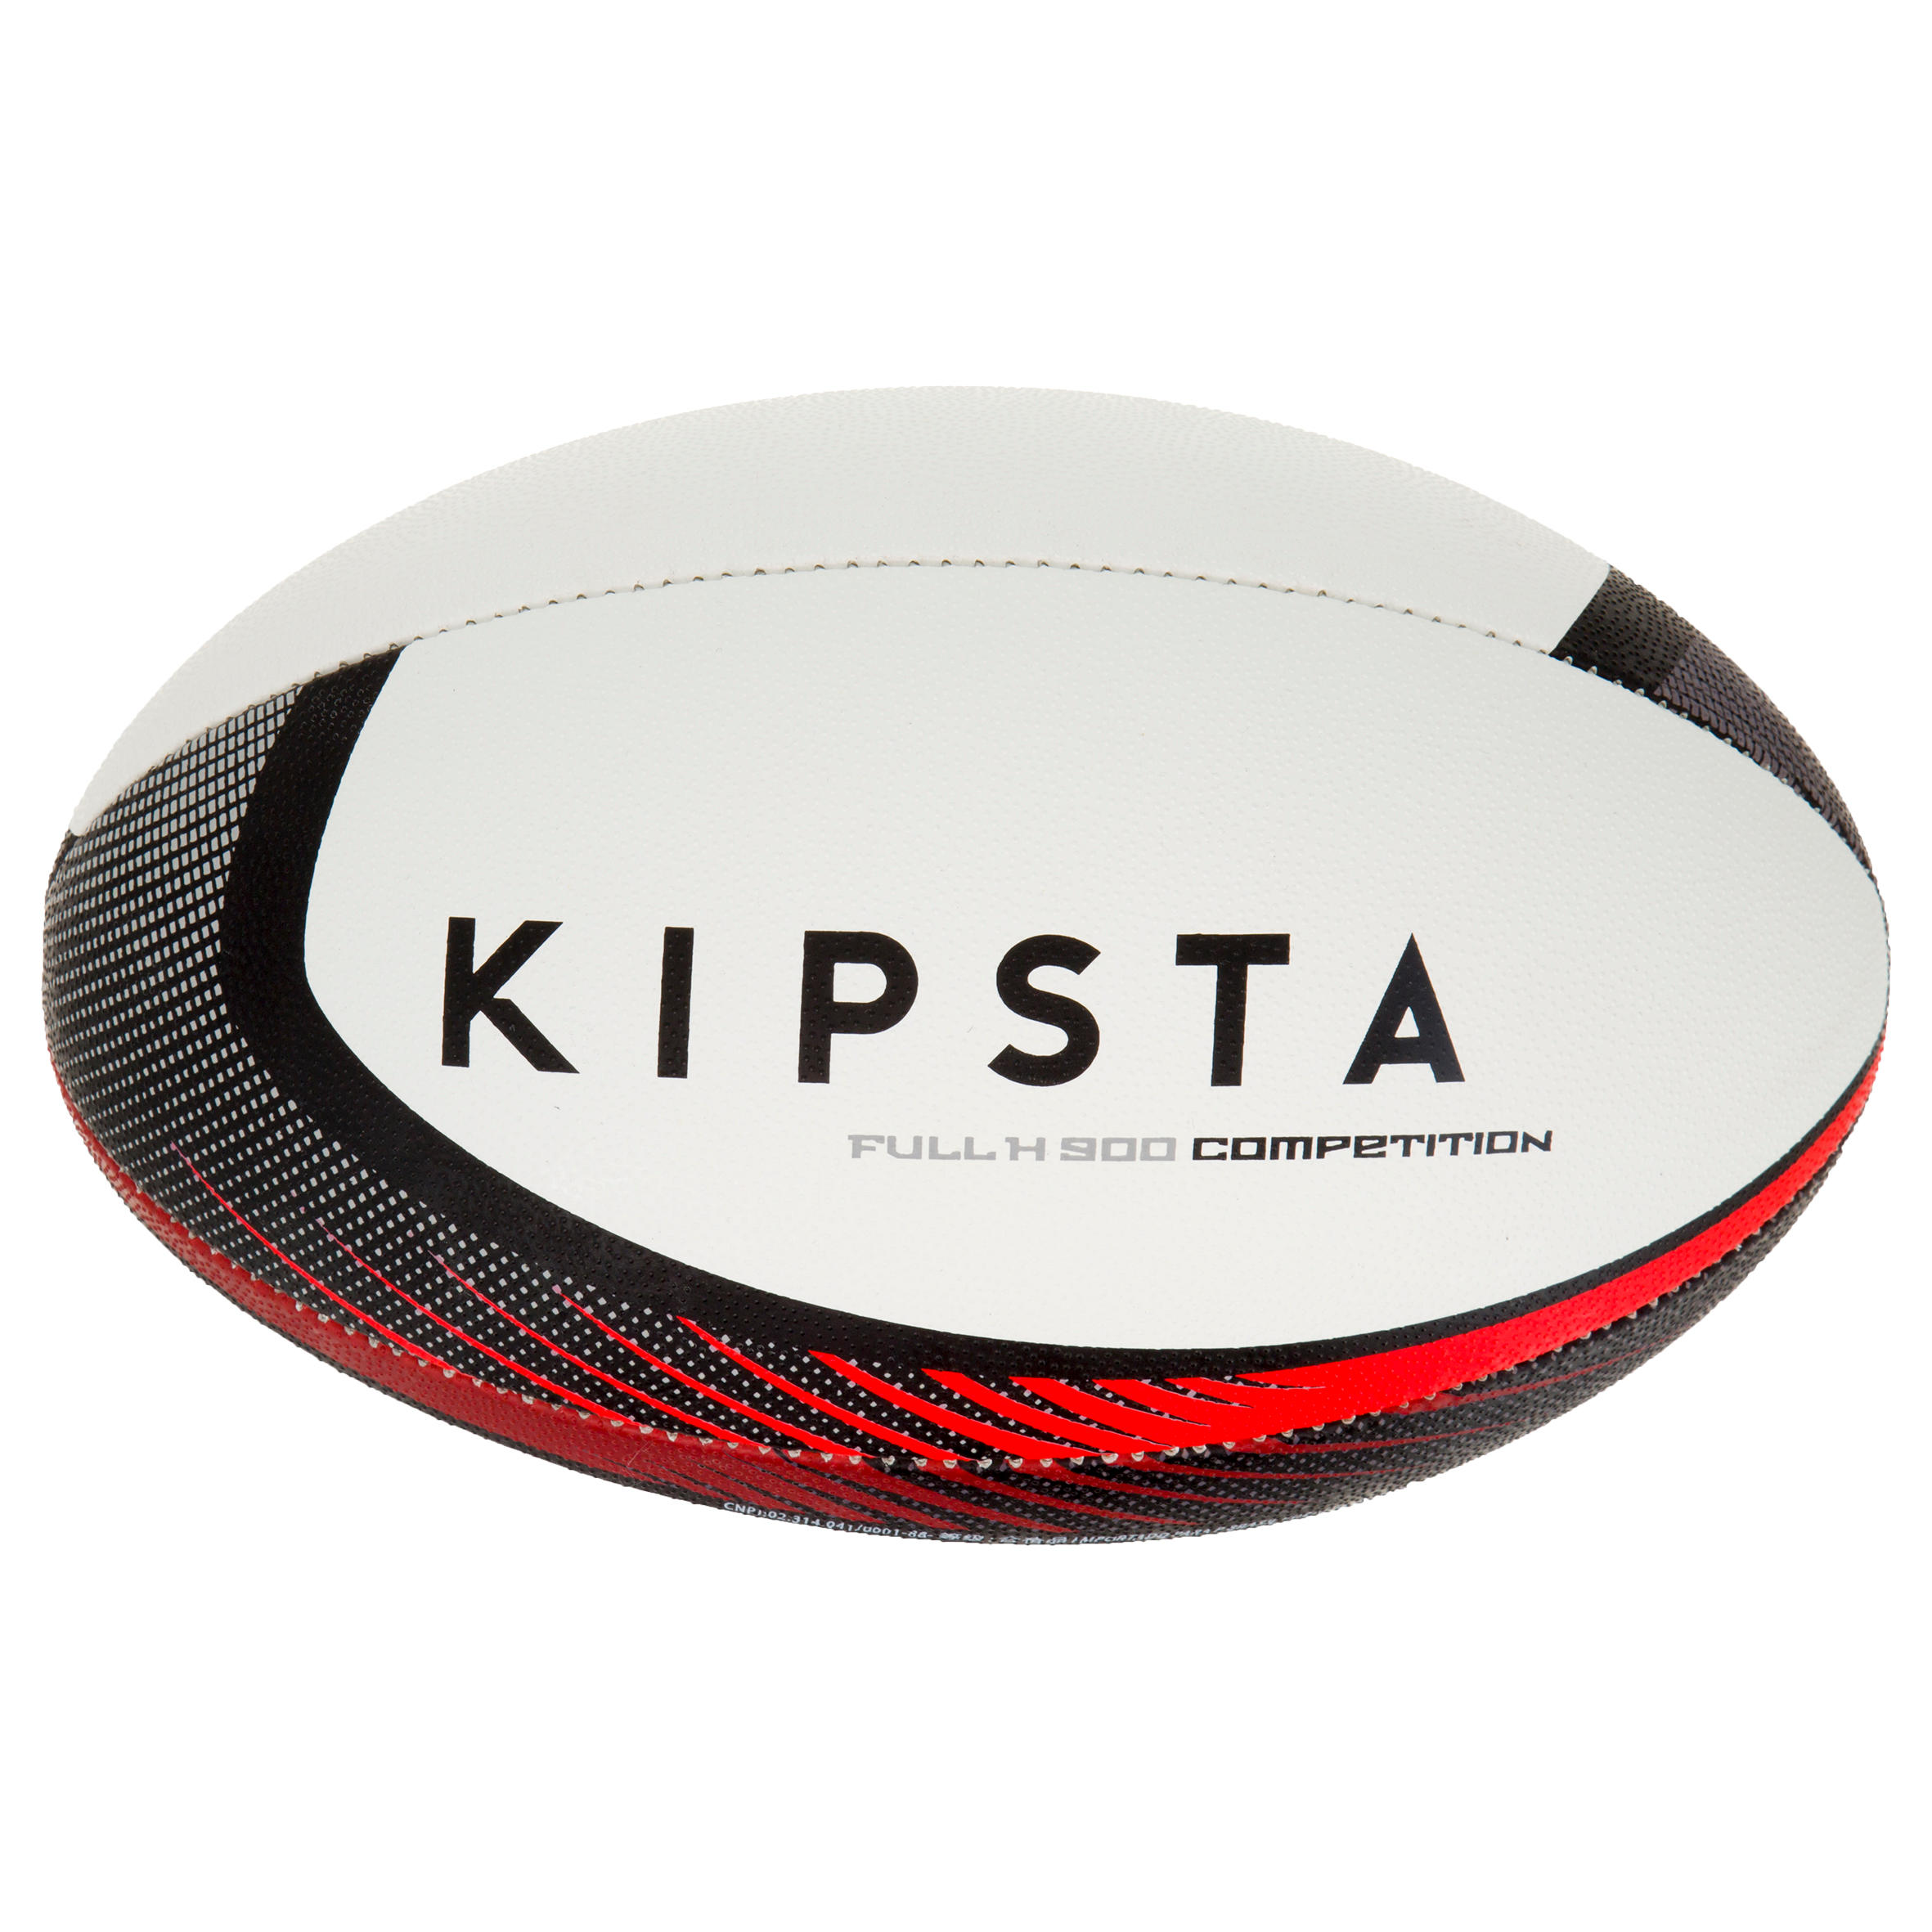 Kipsta Rugbybal Full H 900 maat 5